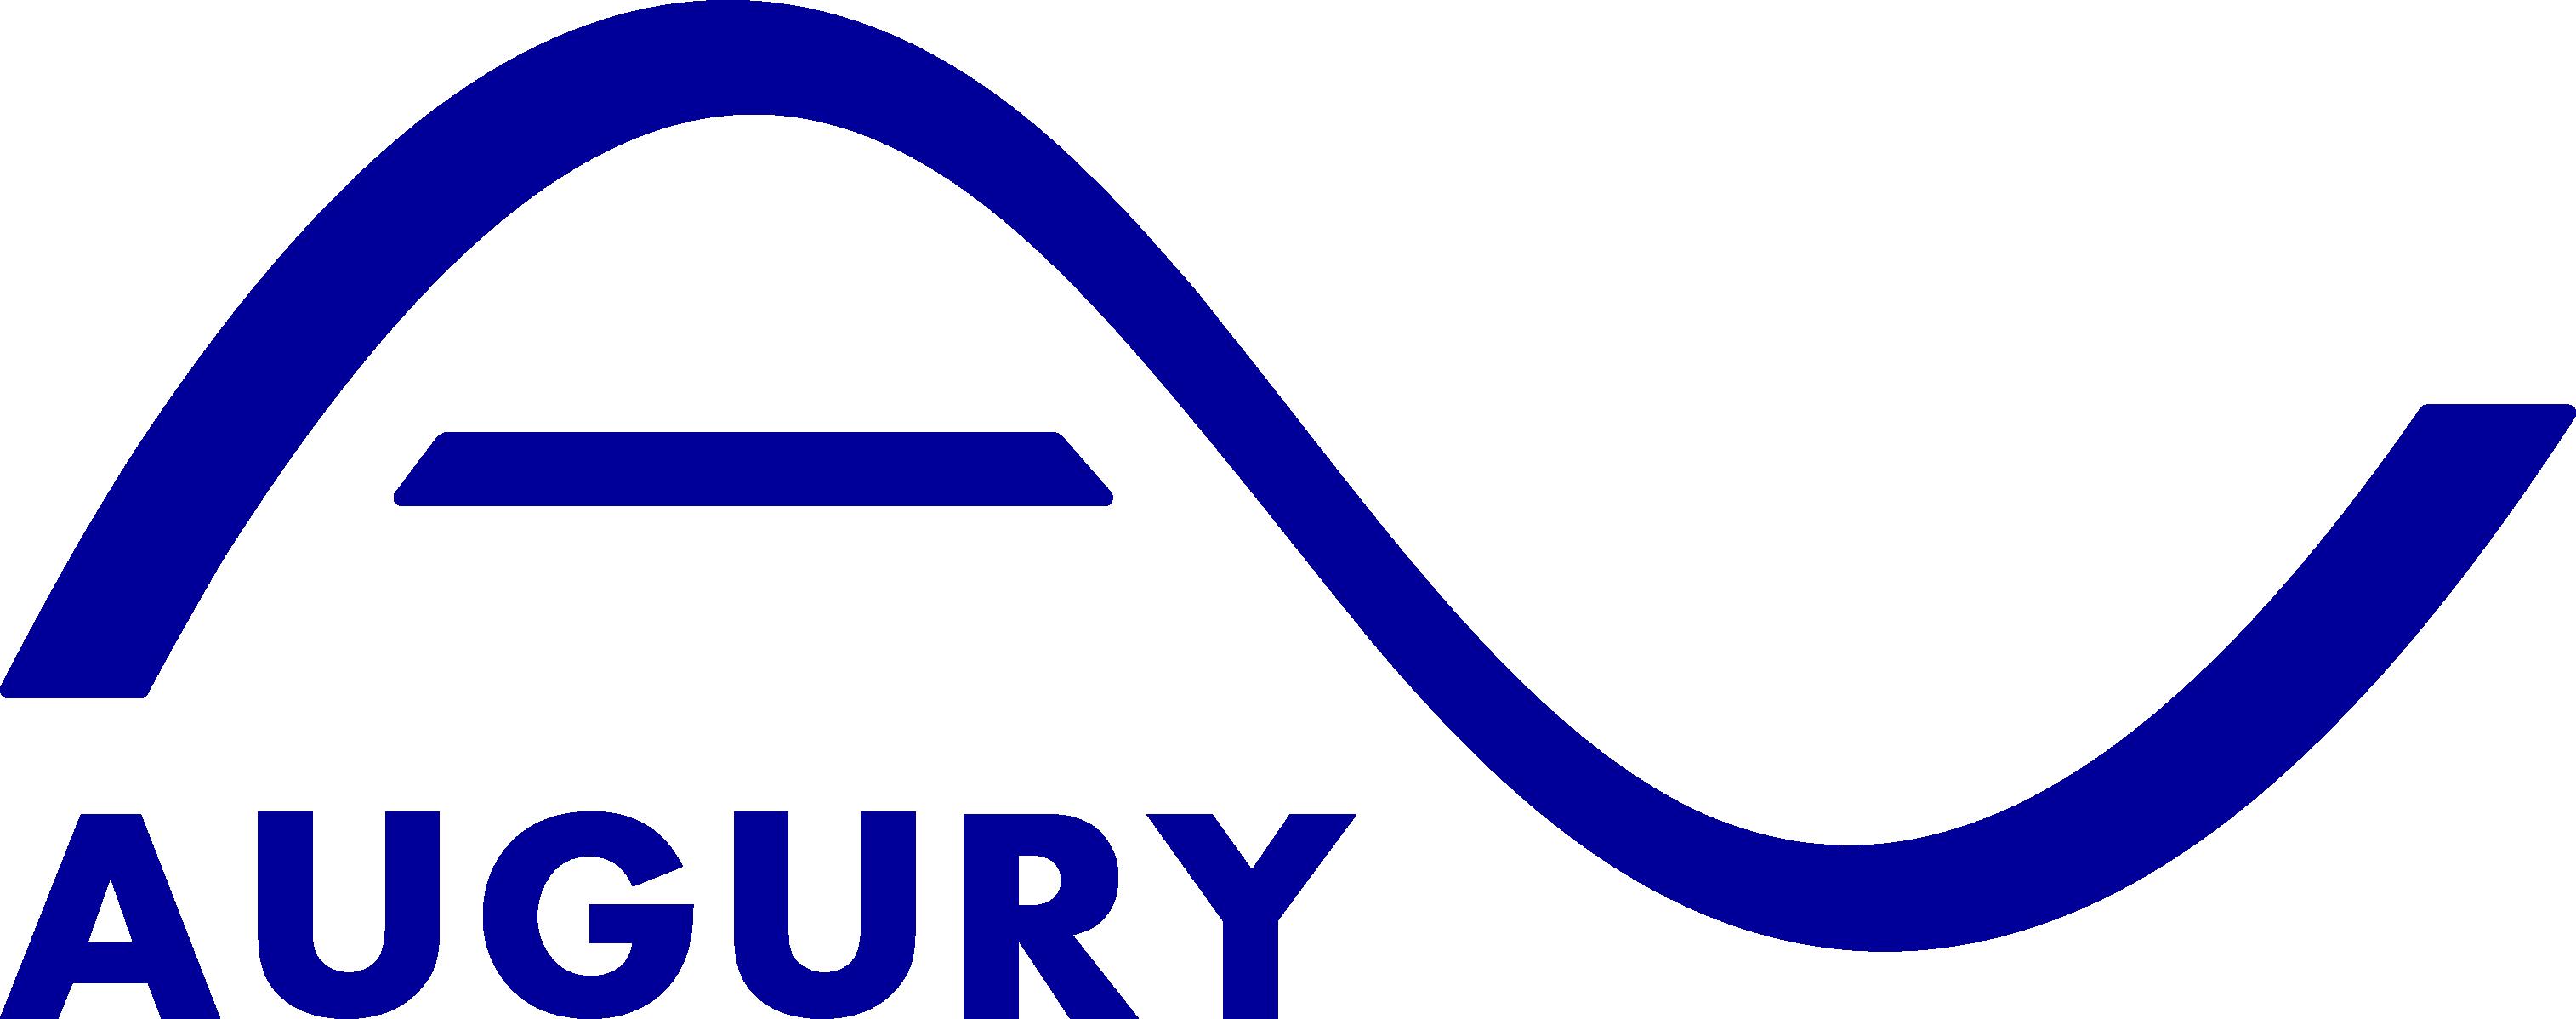 AUGURY_logo